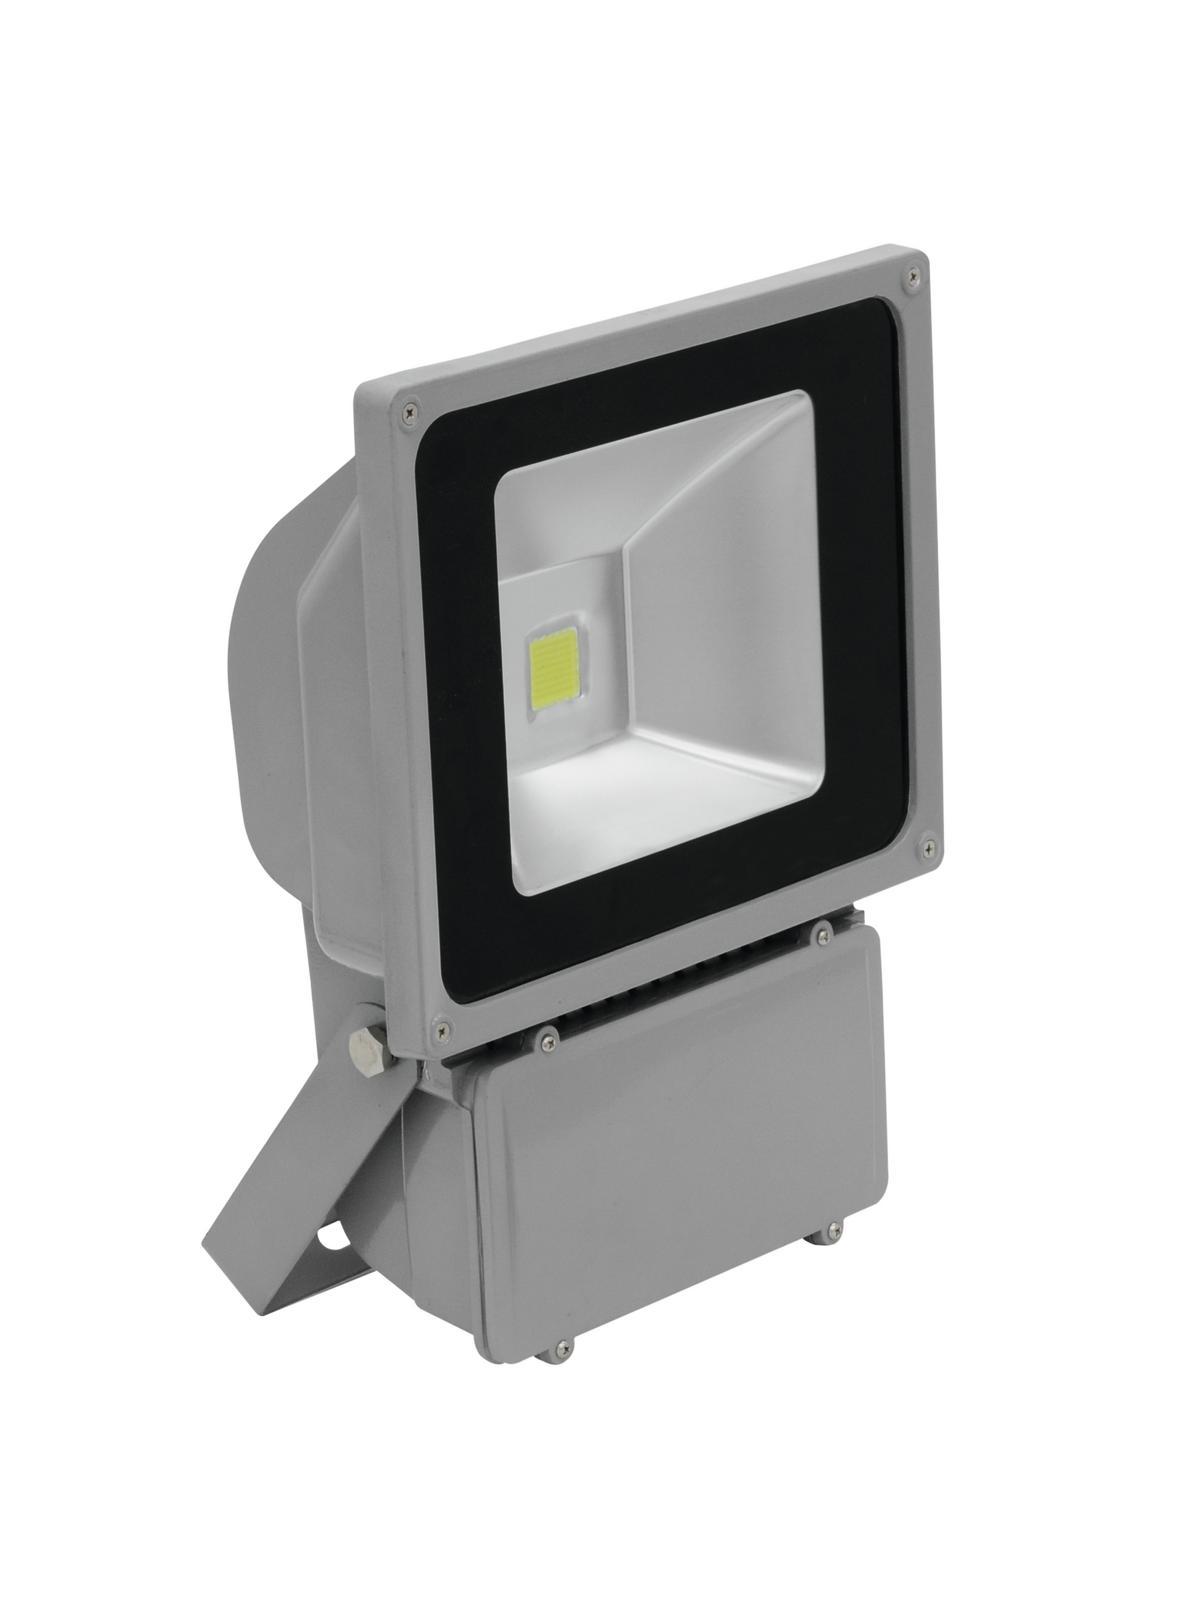 EUROLITE LED IP FL-80 PANNOCCHIA 6400K 120°